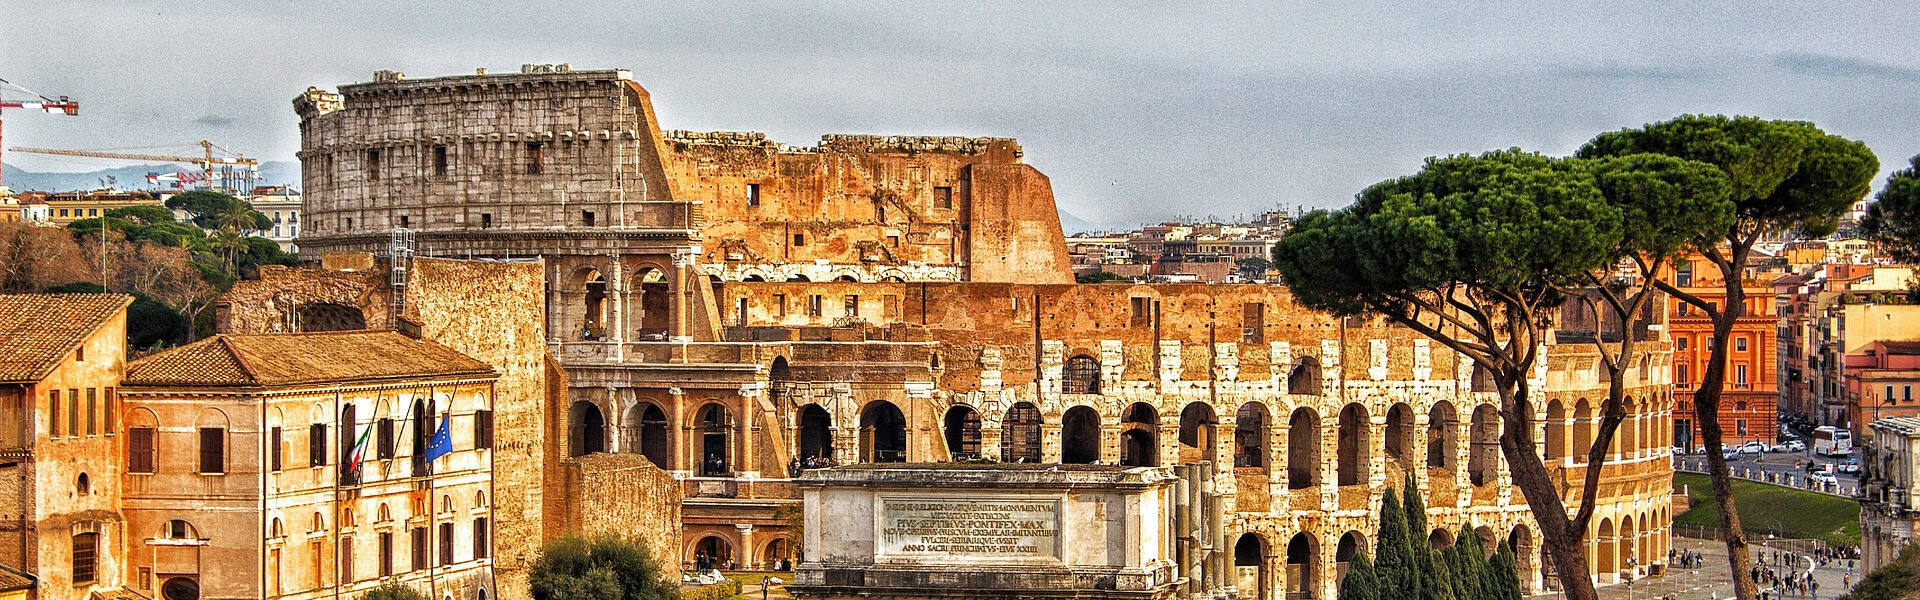 Get Fauna Music Sunglasses in Rome, Roma